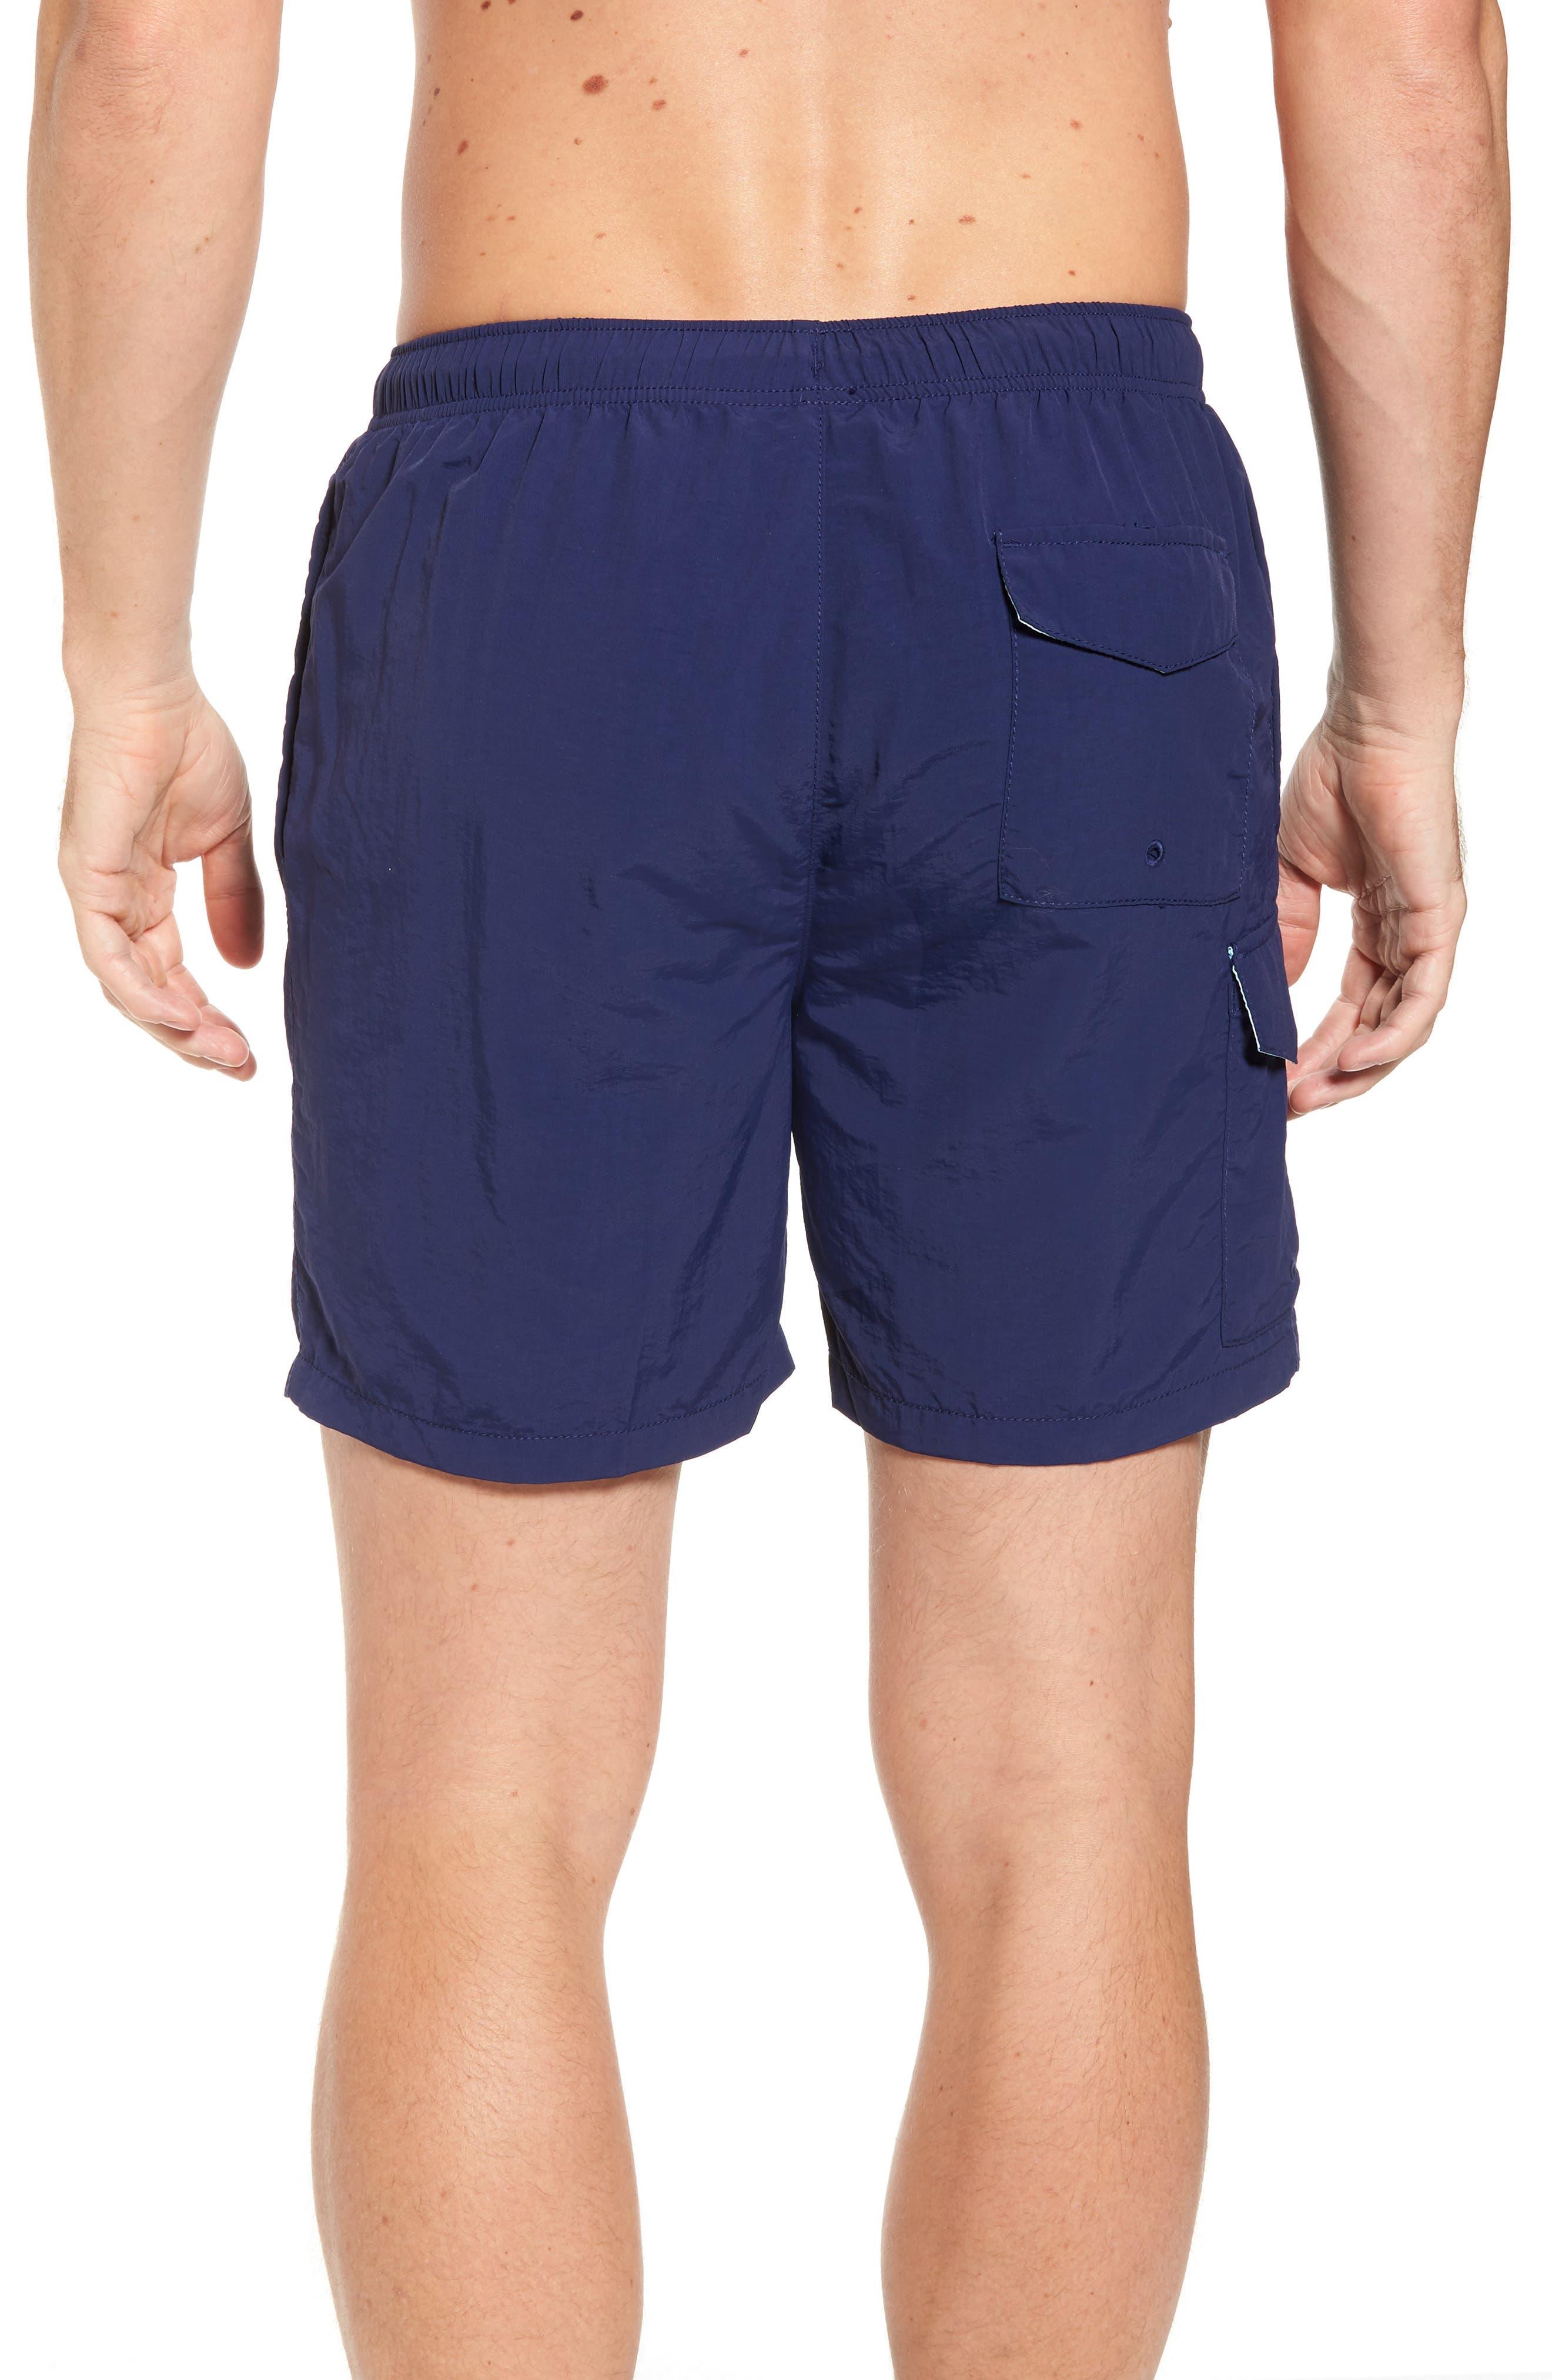 d9dd3a781d77f Men's Short Swimwear, Boardshorts & Swim Trunks | Nordstrom